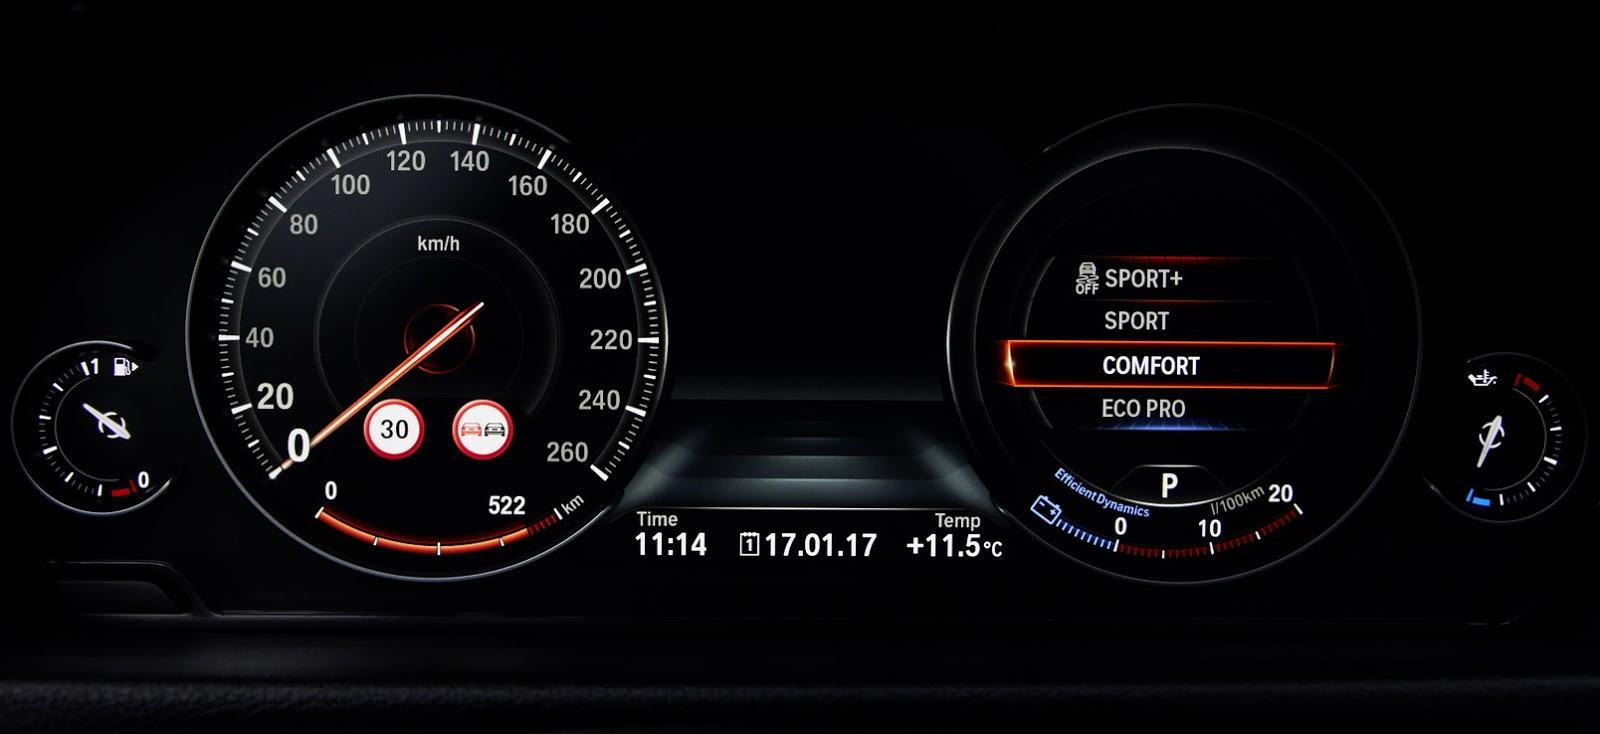 Painel do BMW Série 4 Coupé